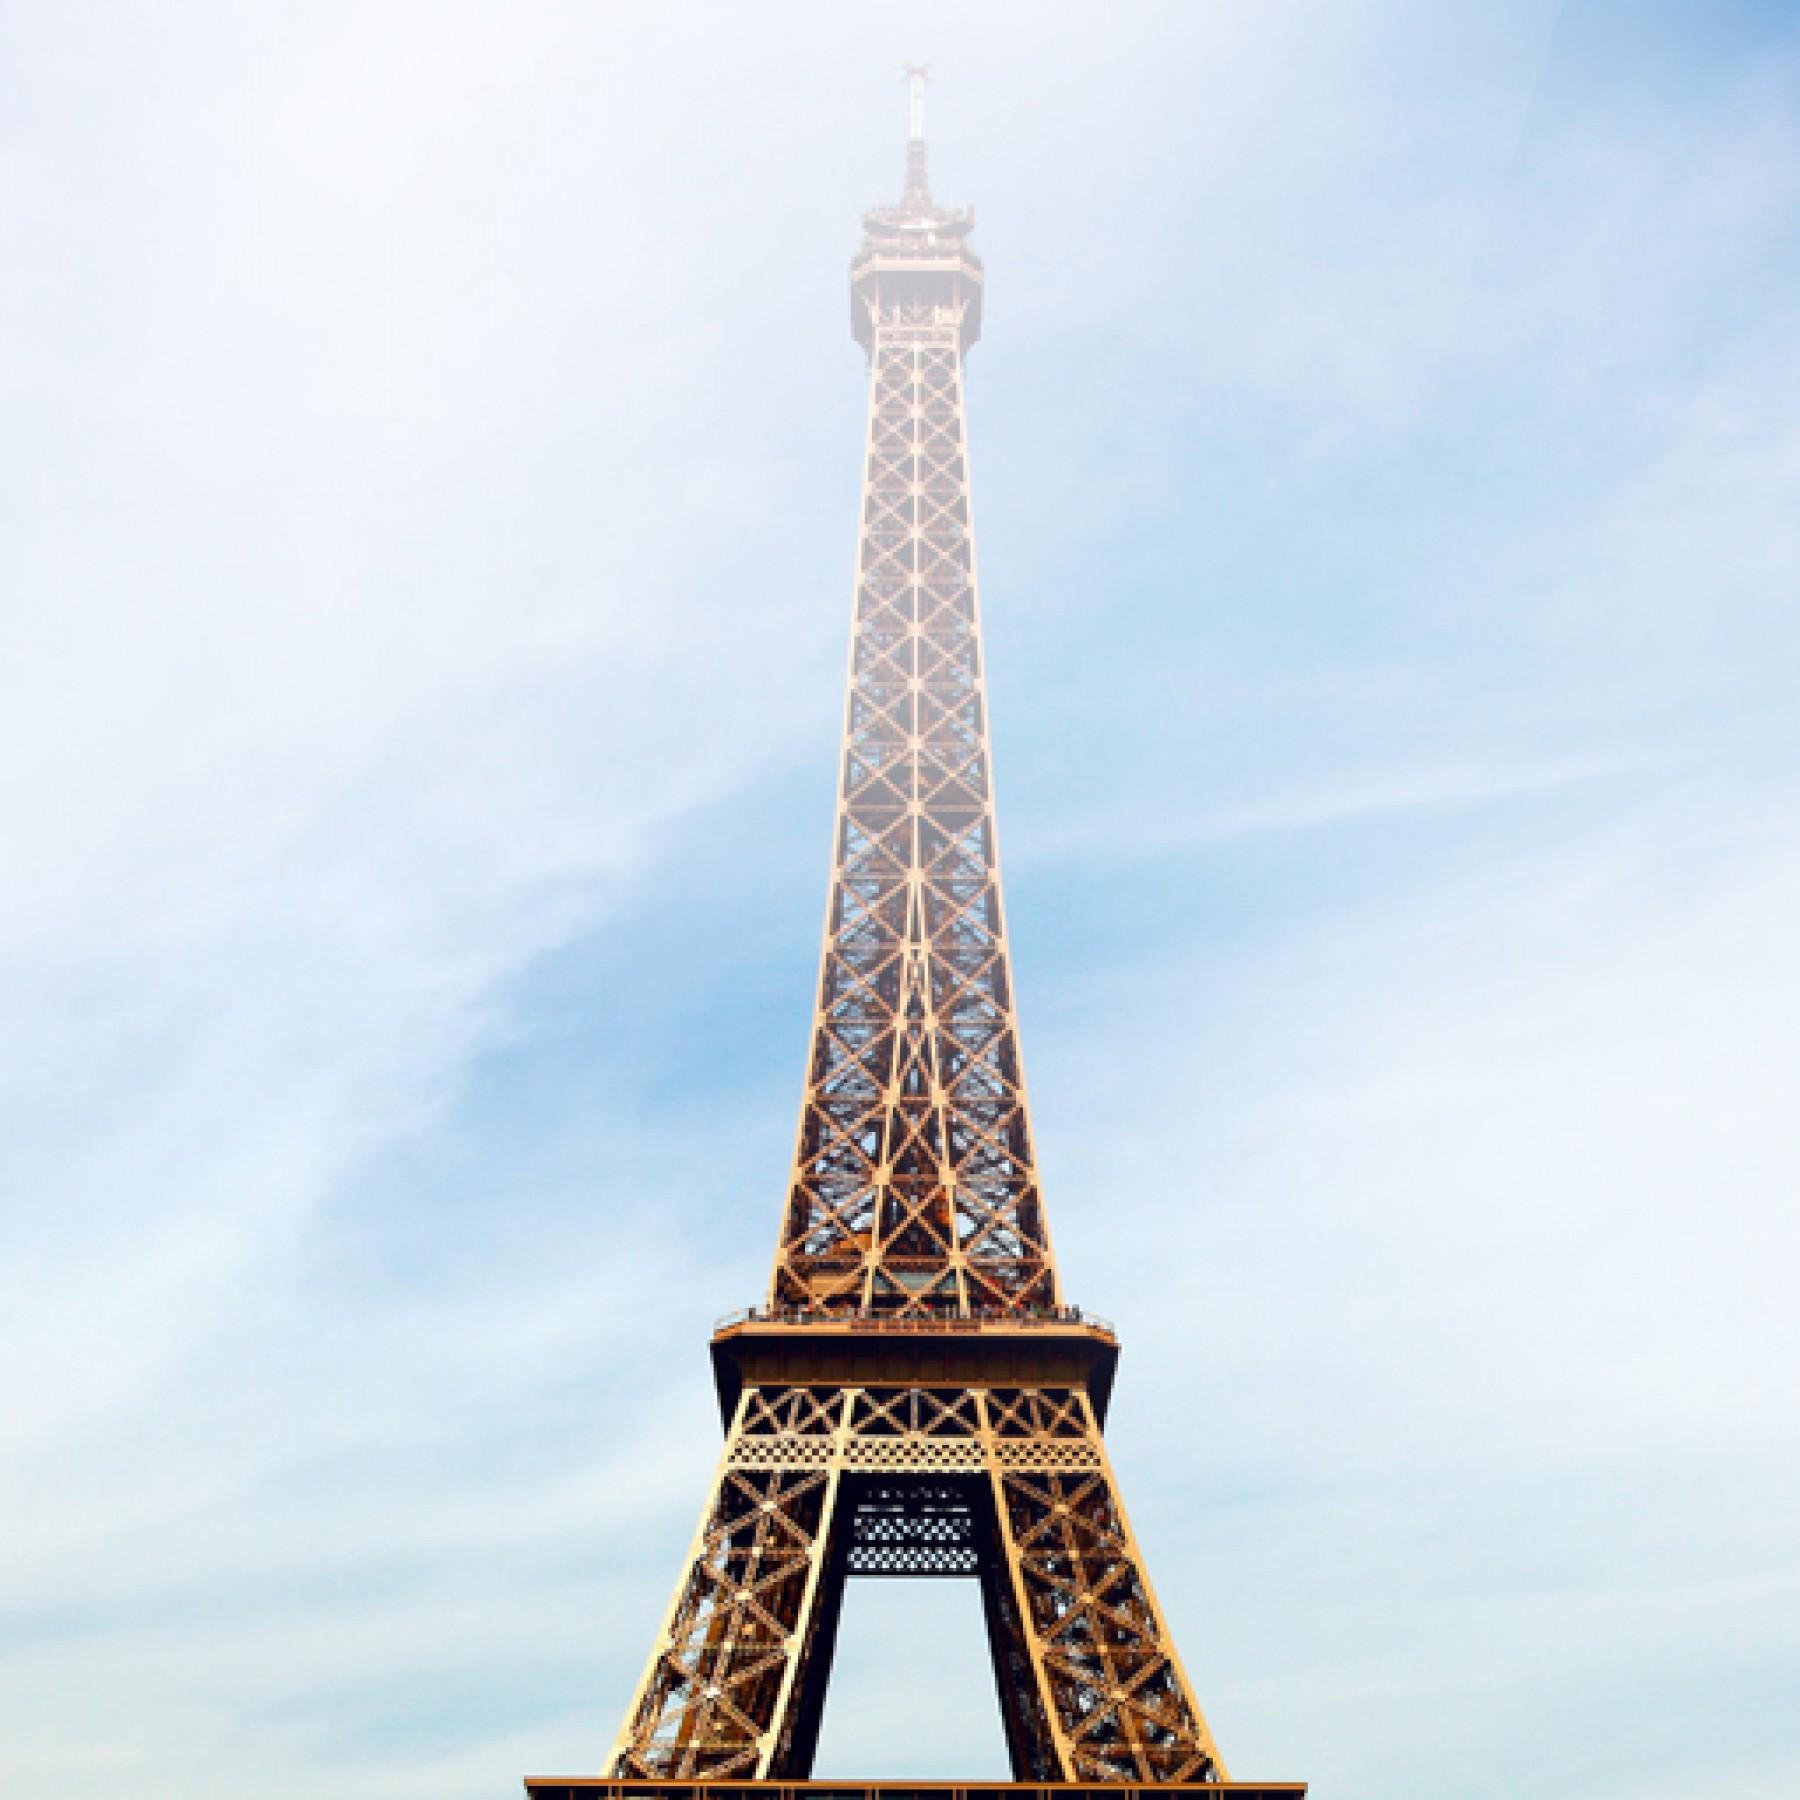 eiffel-tower-travel-adults-main-location